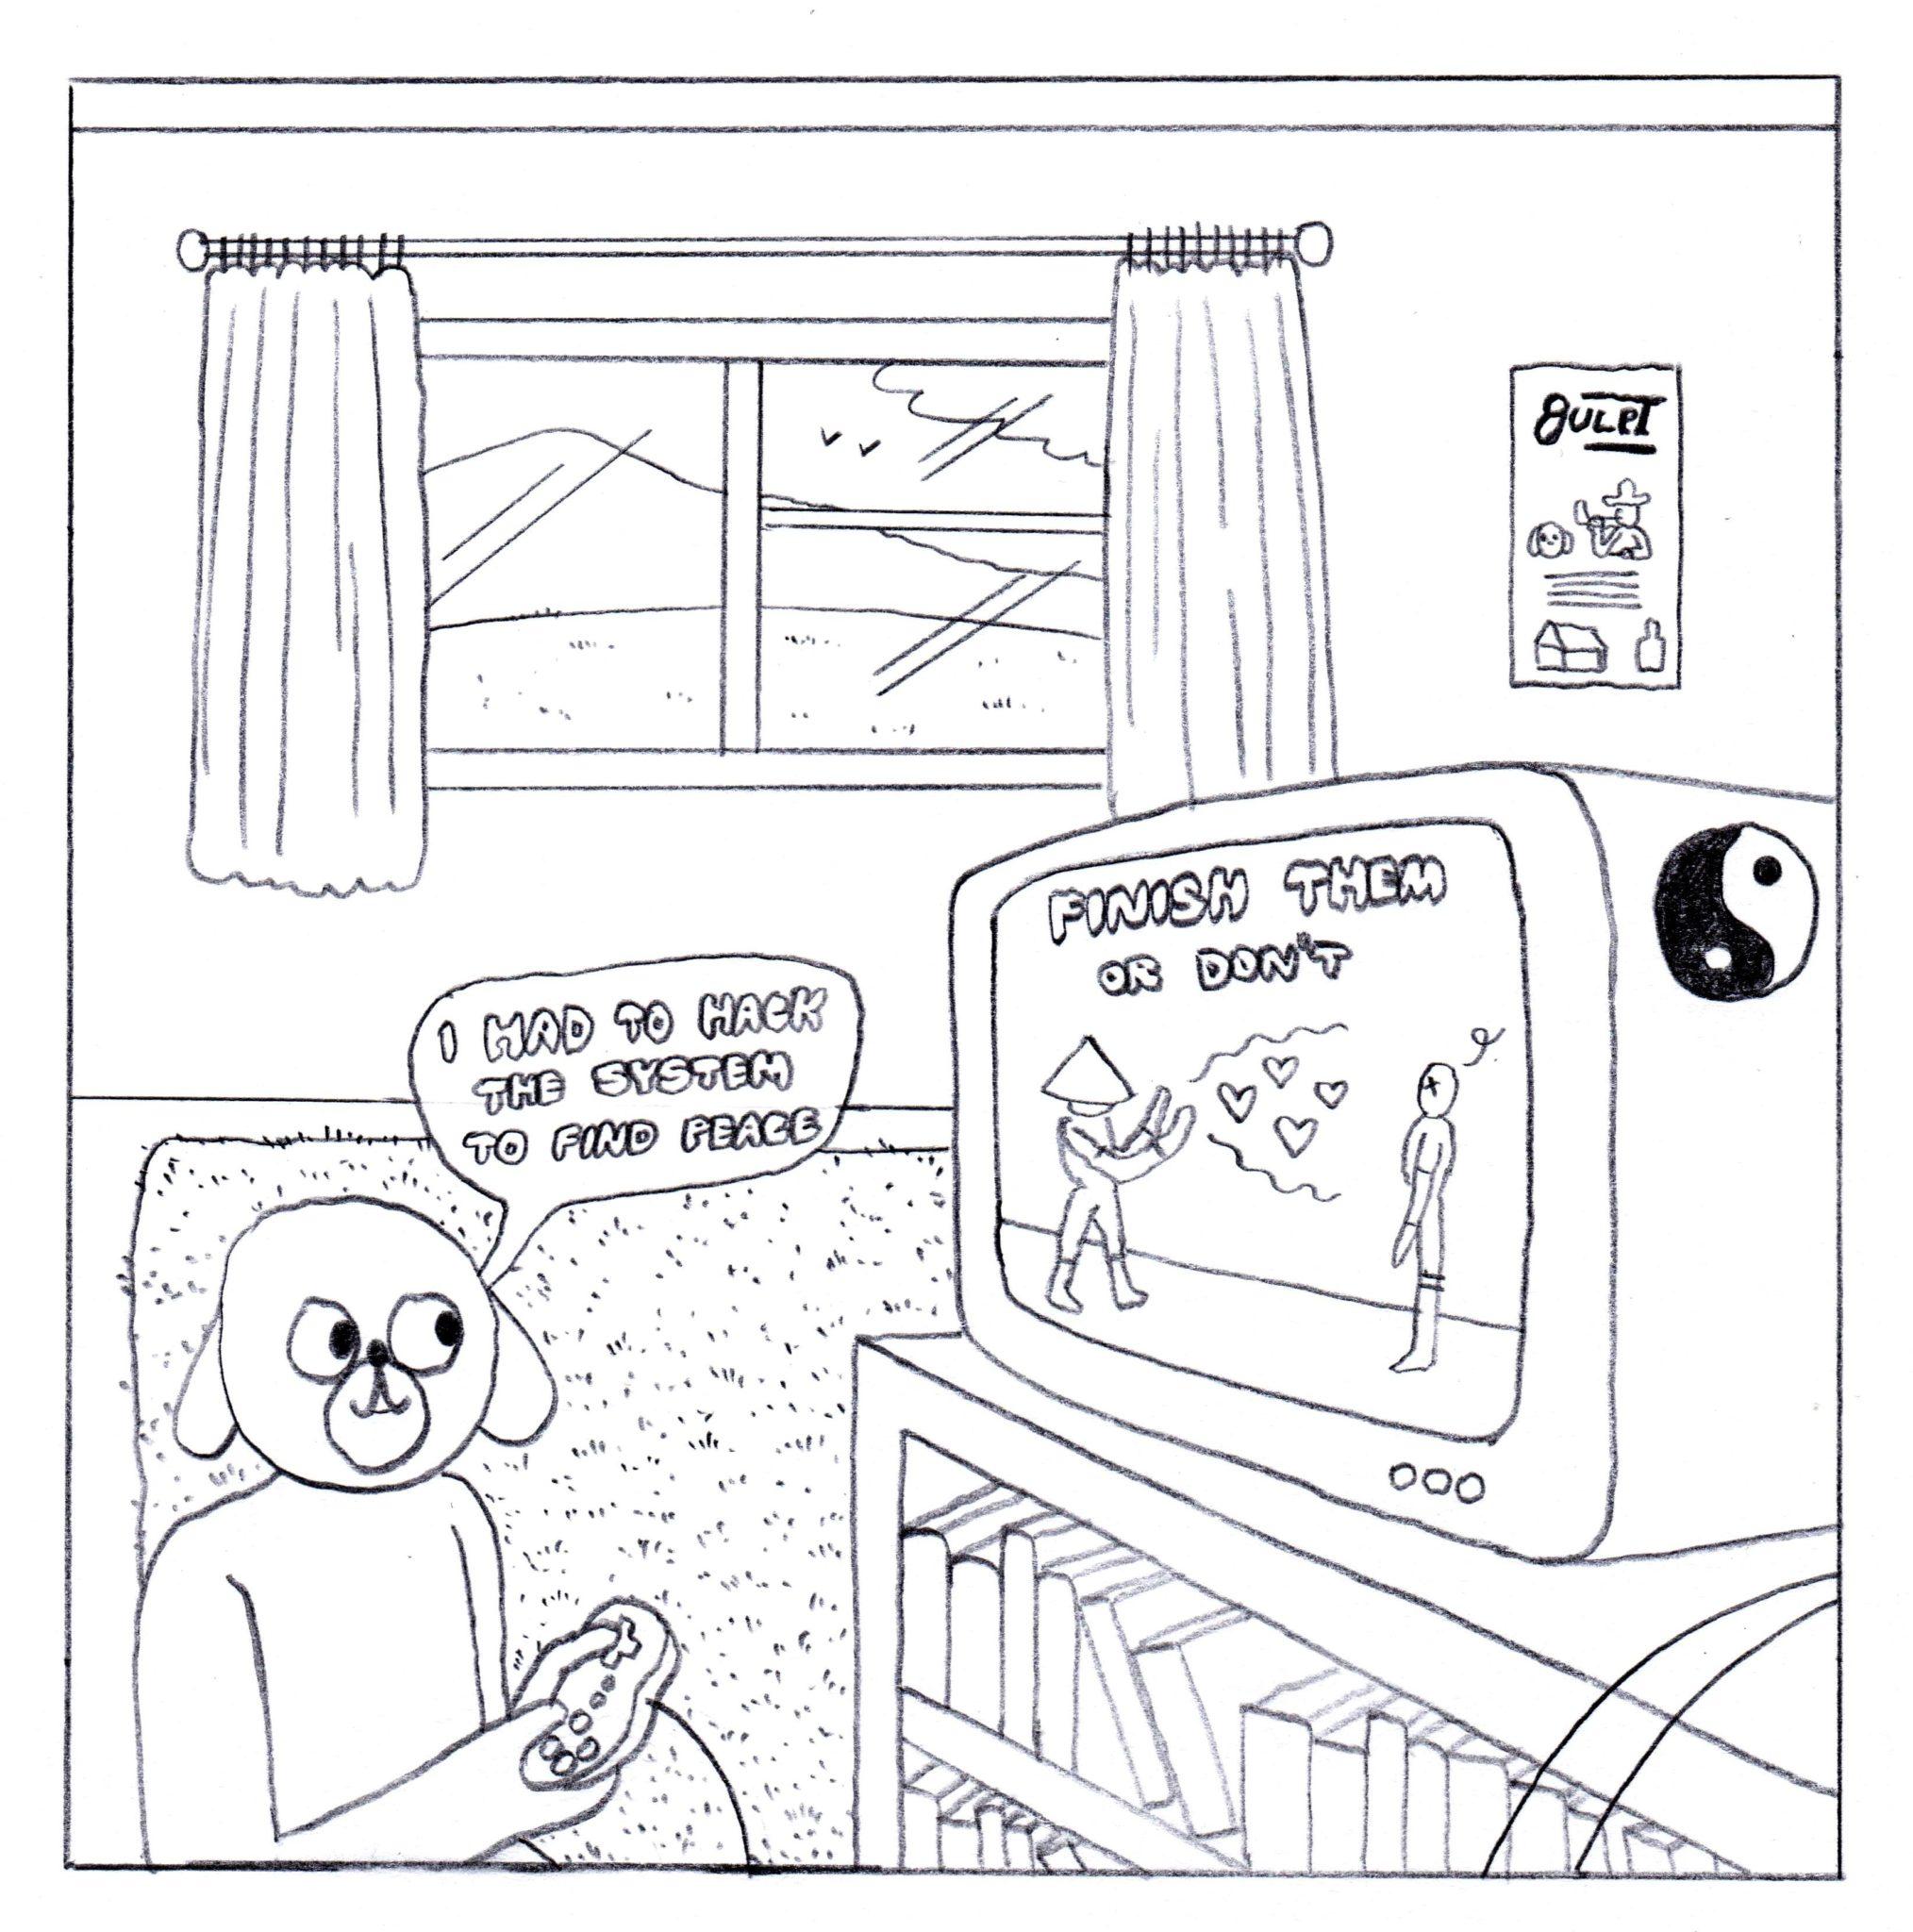 Dog Comics 186-190 - Page 1